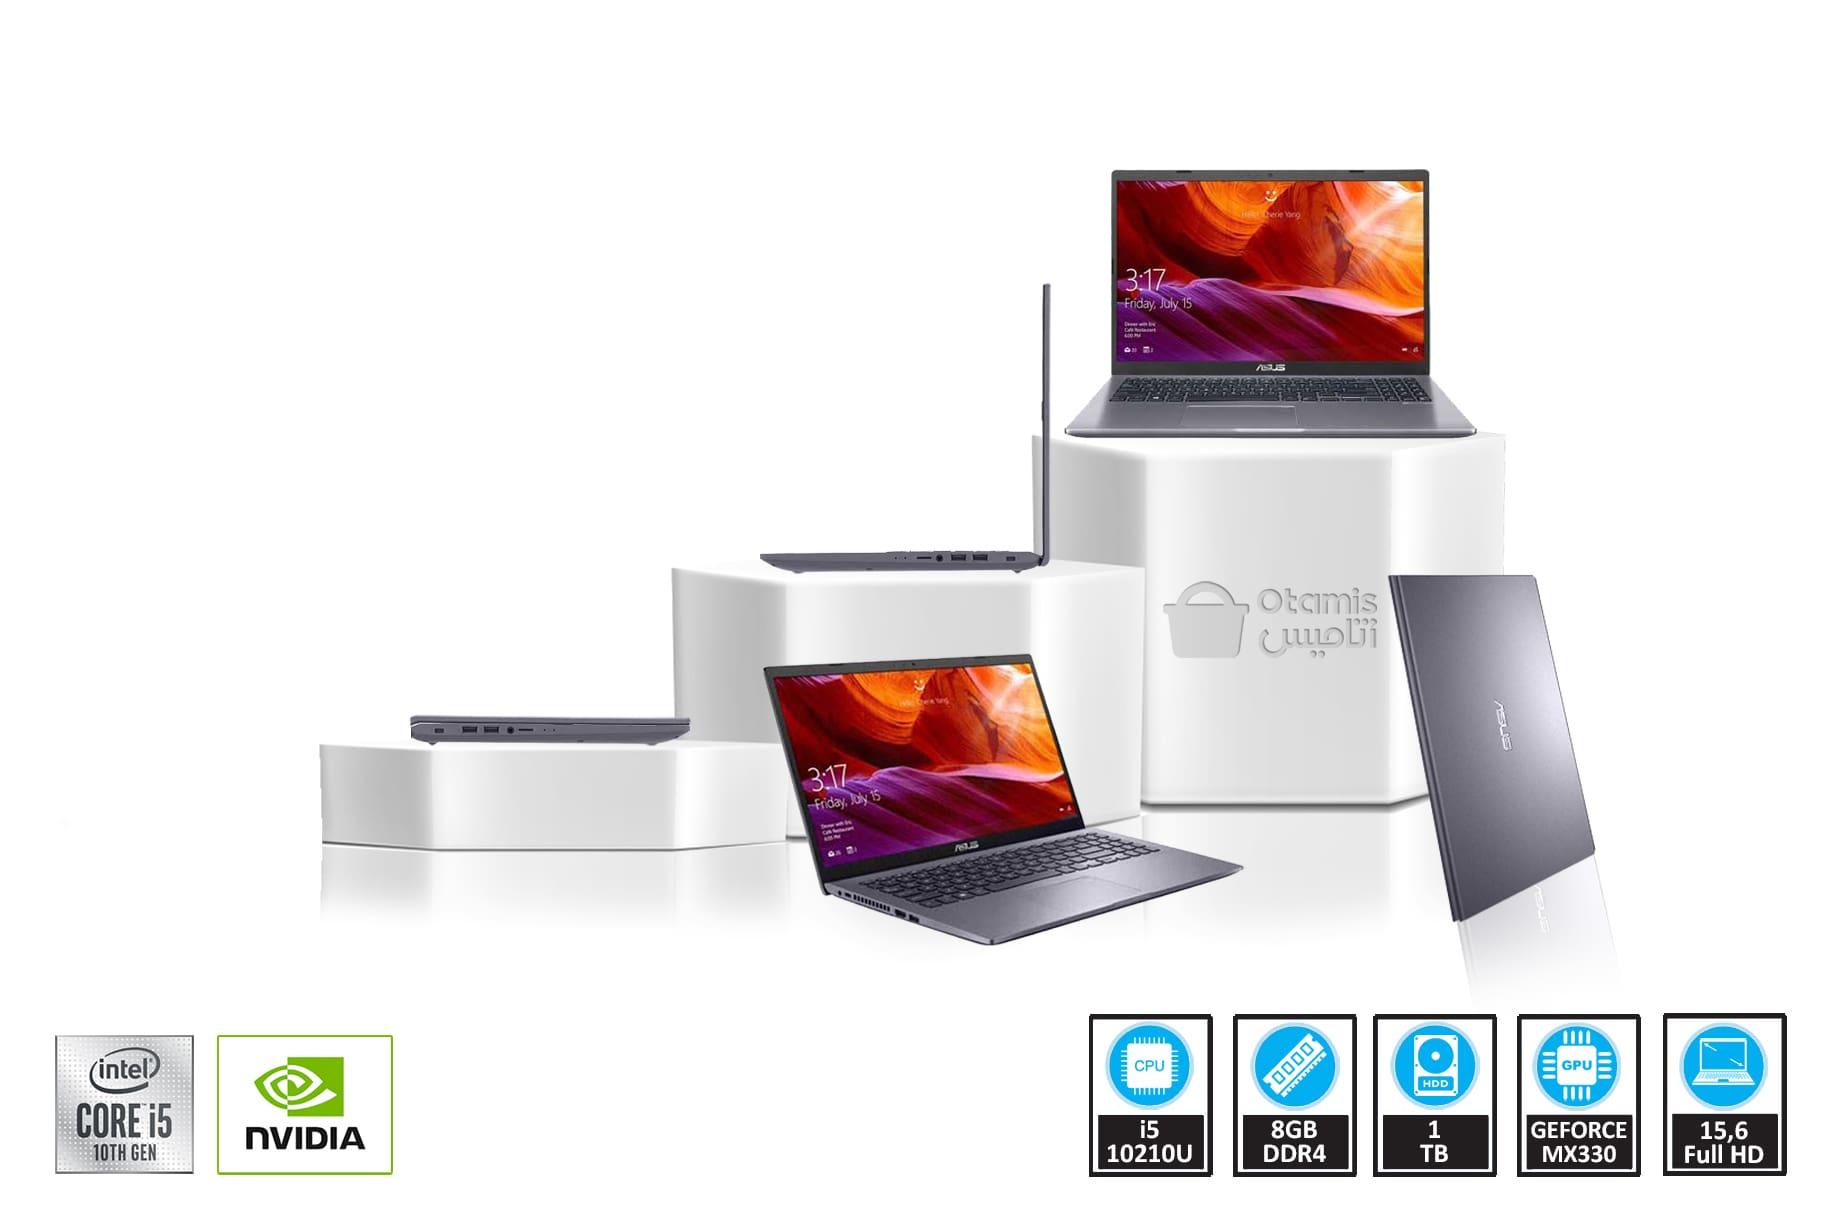 VivoBook R545FJ - A